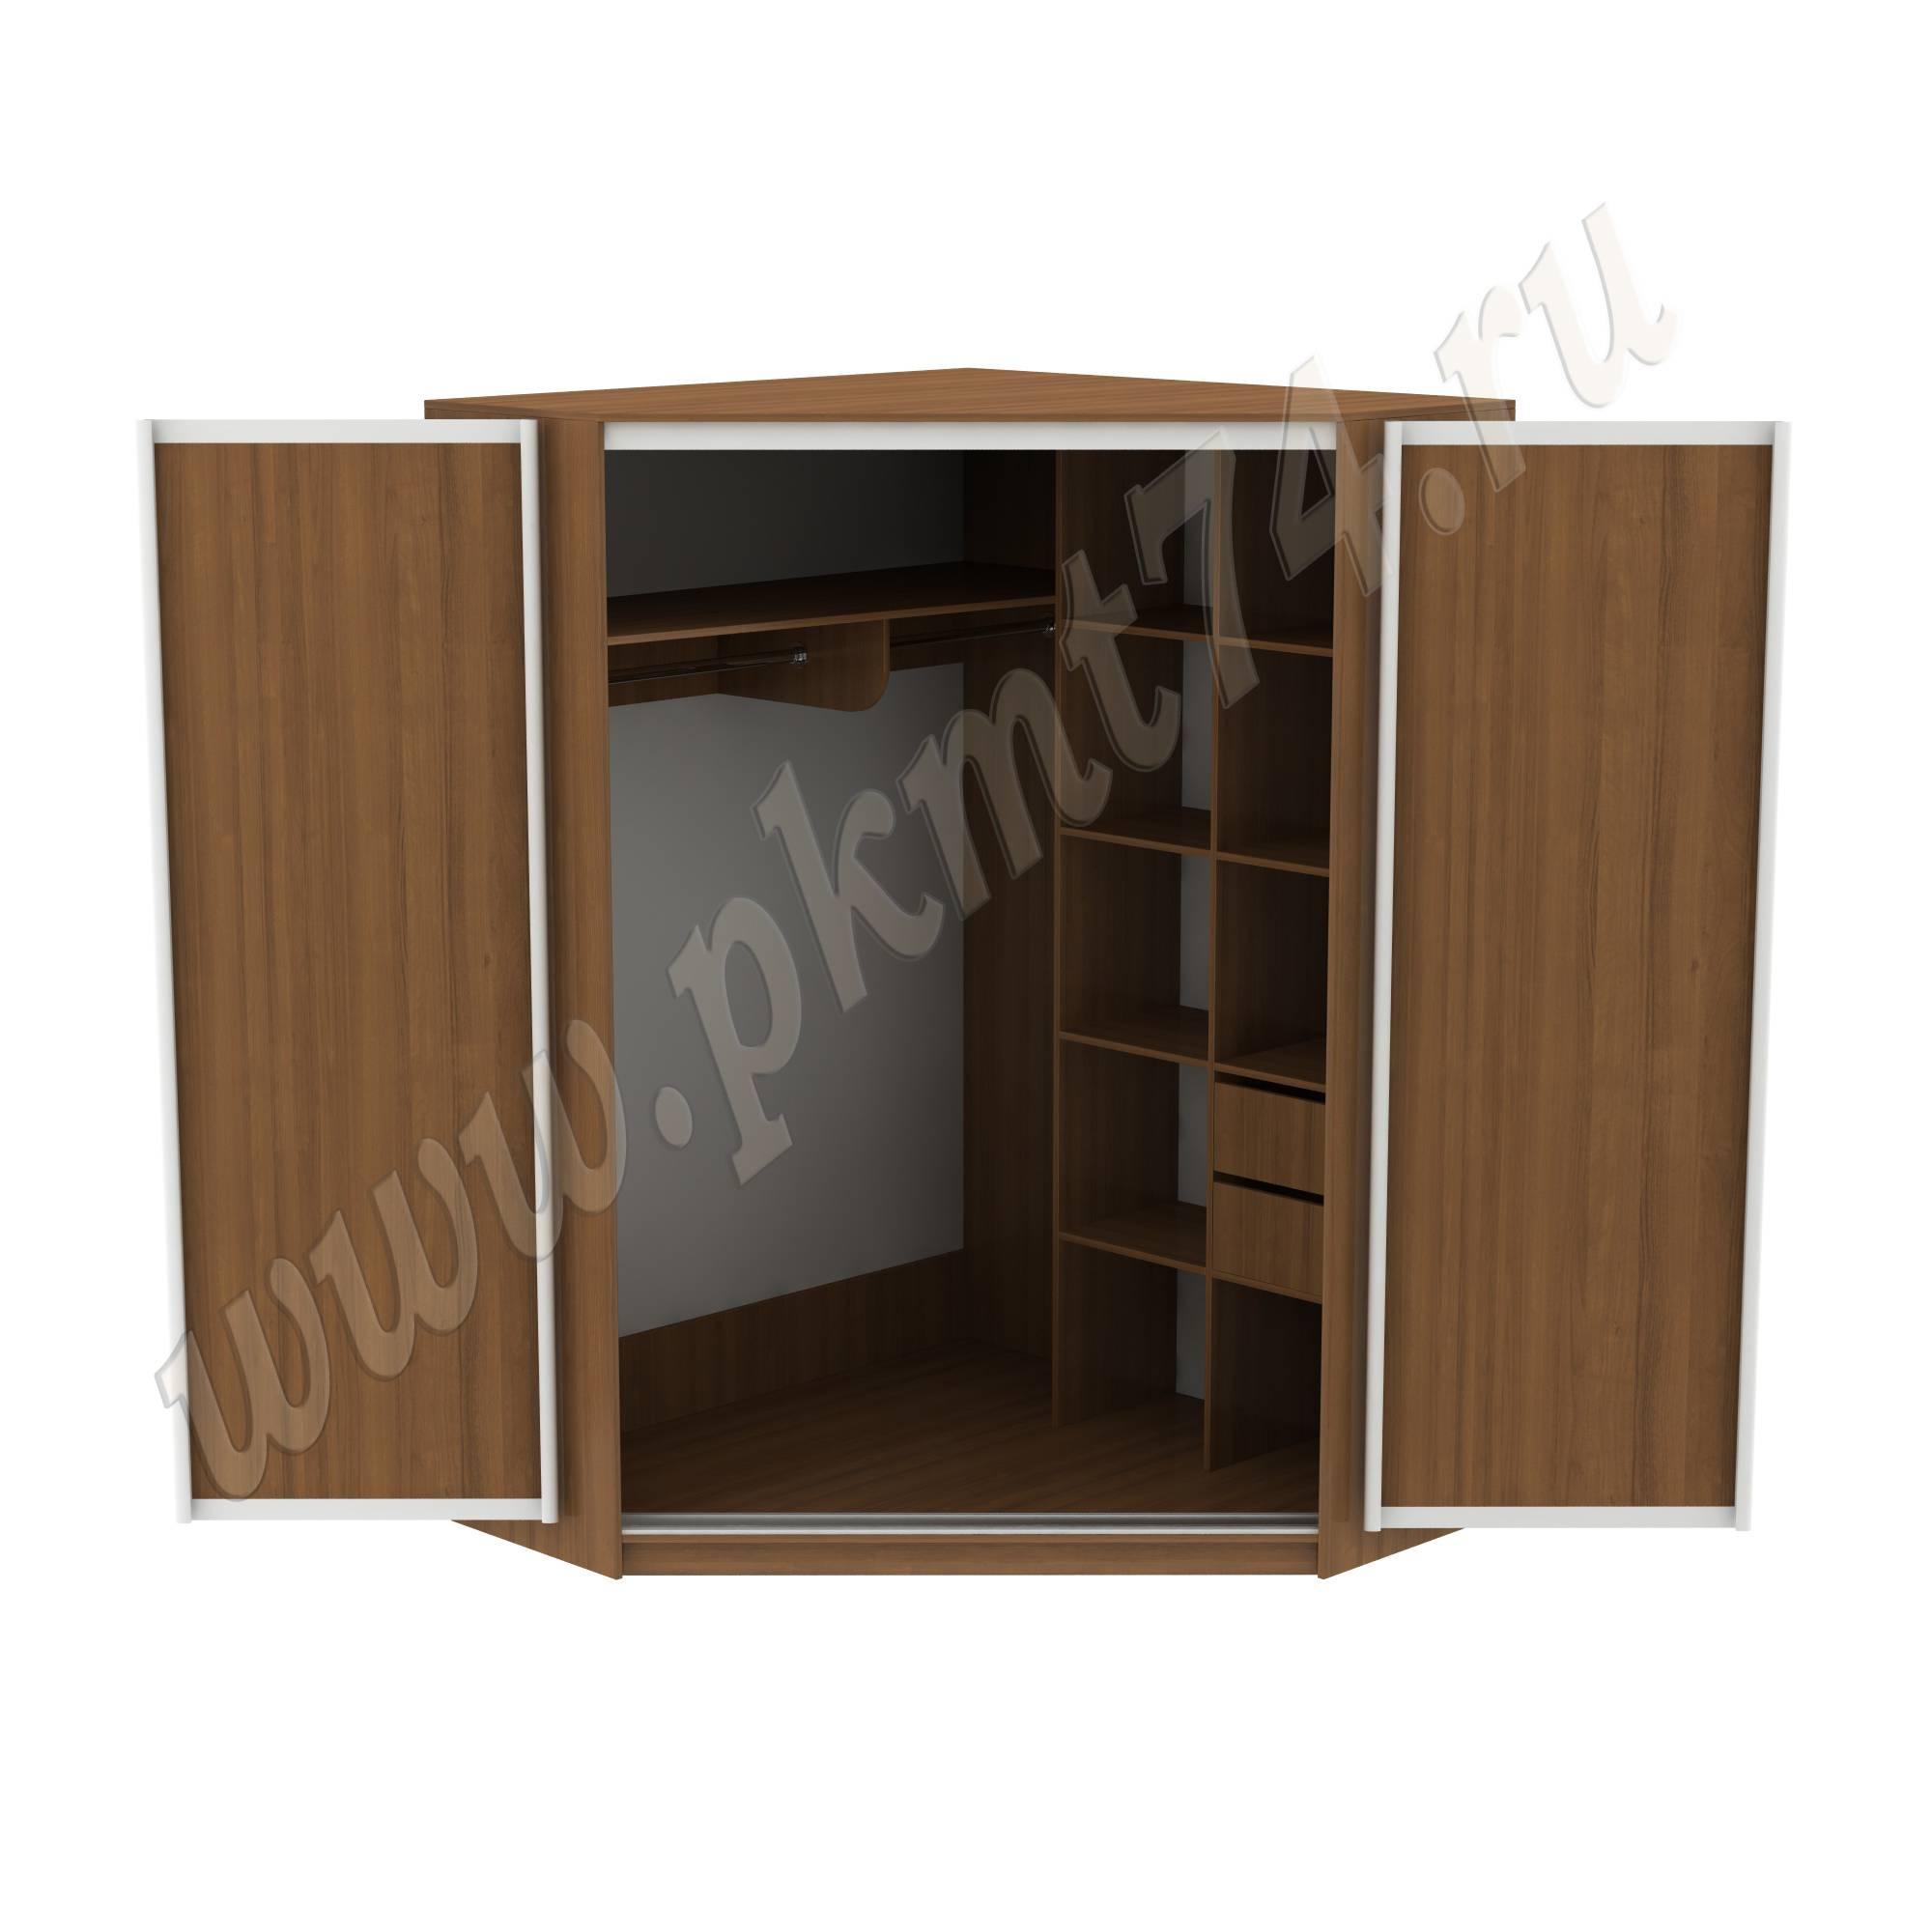 Шкаф купе угловой МТ 15-20 Орех